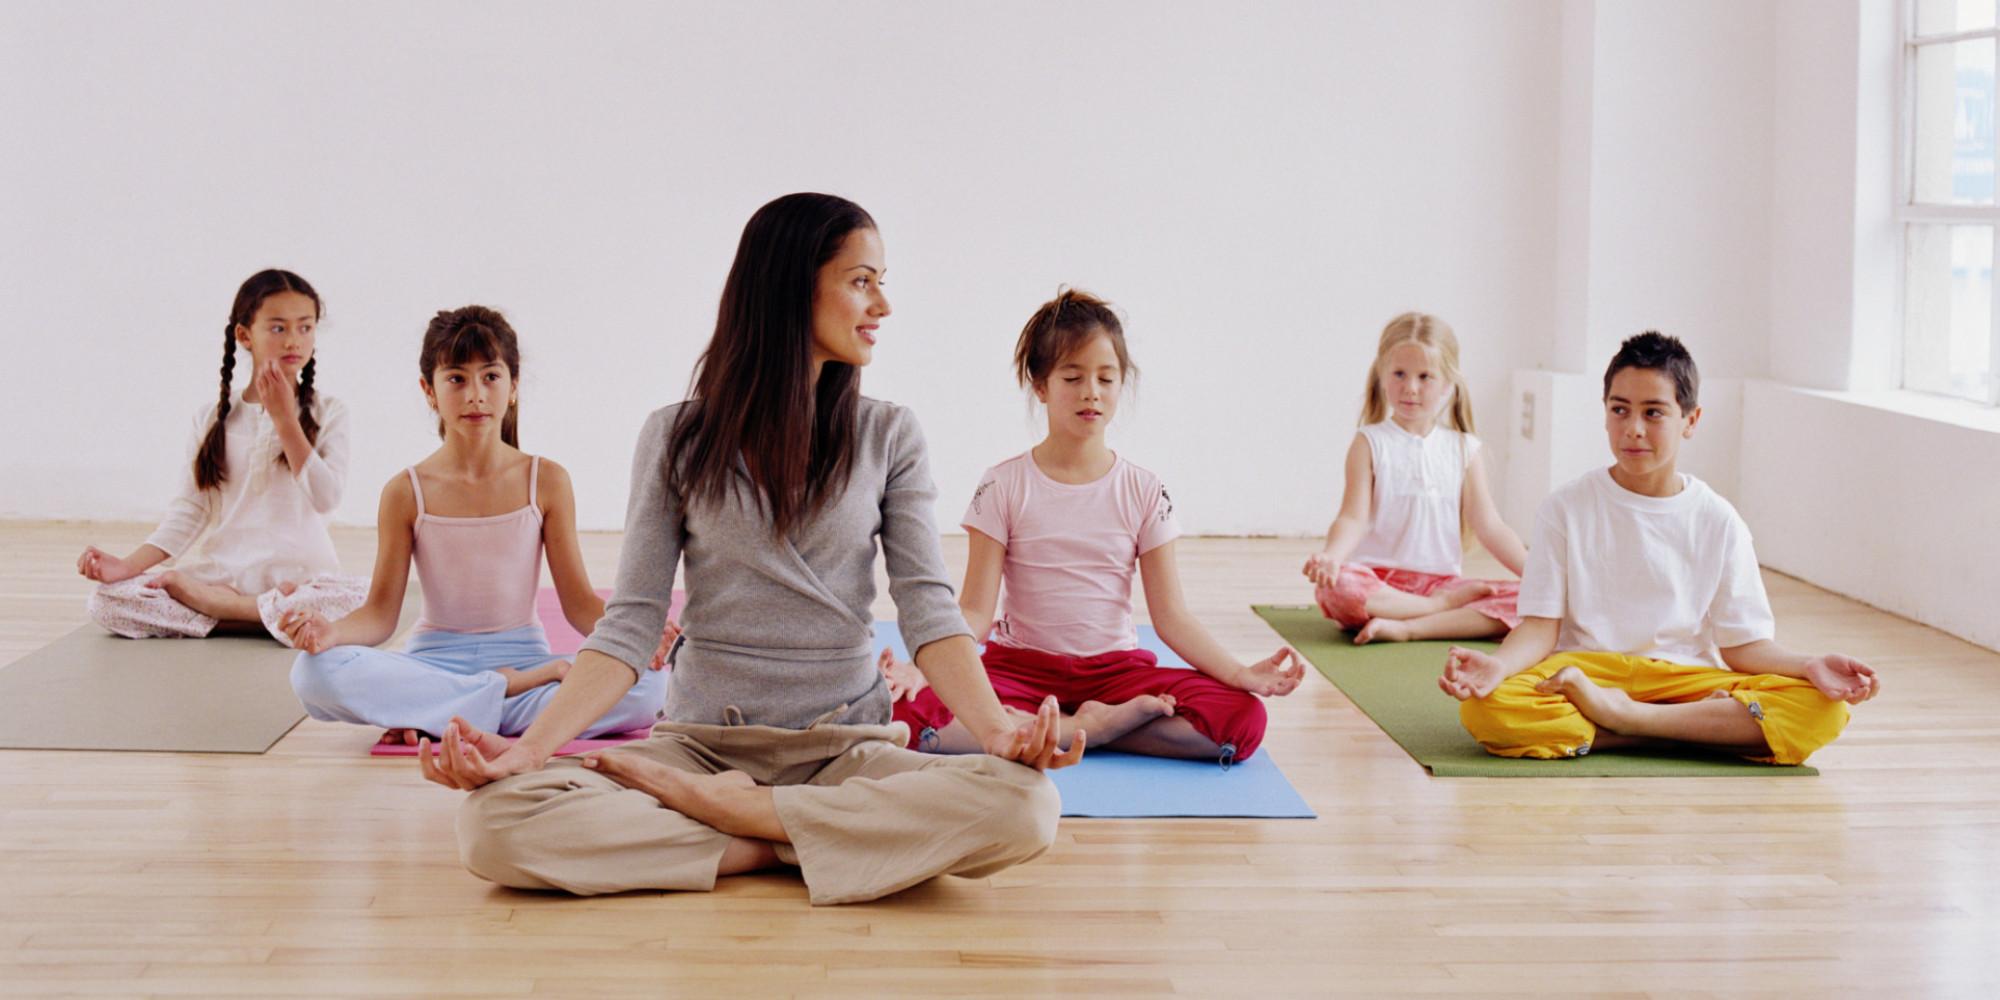 Why do kids need to do yoga? 1